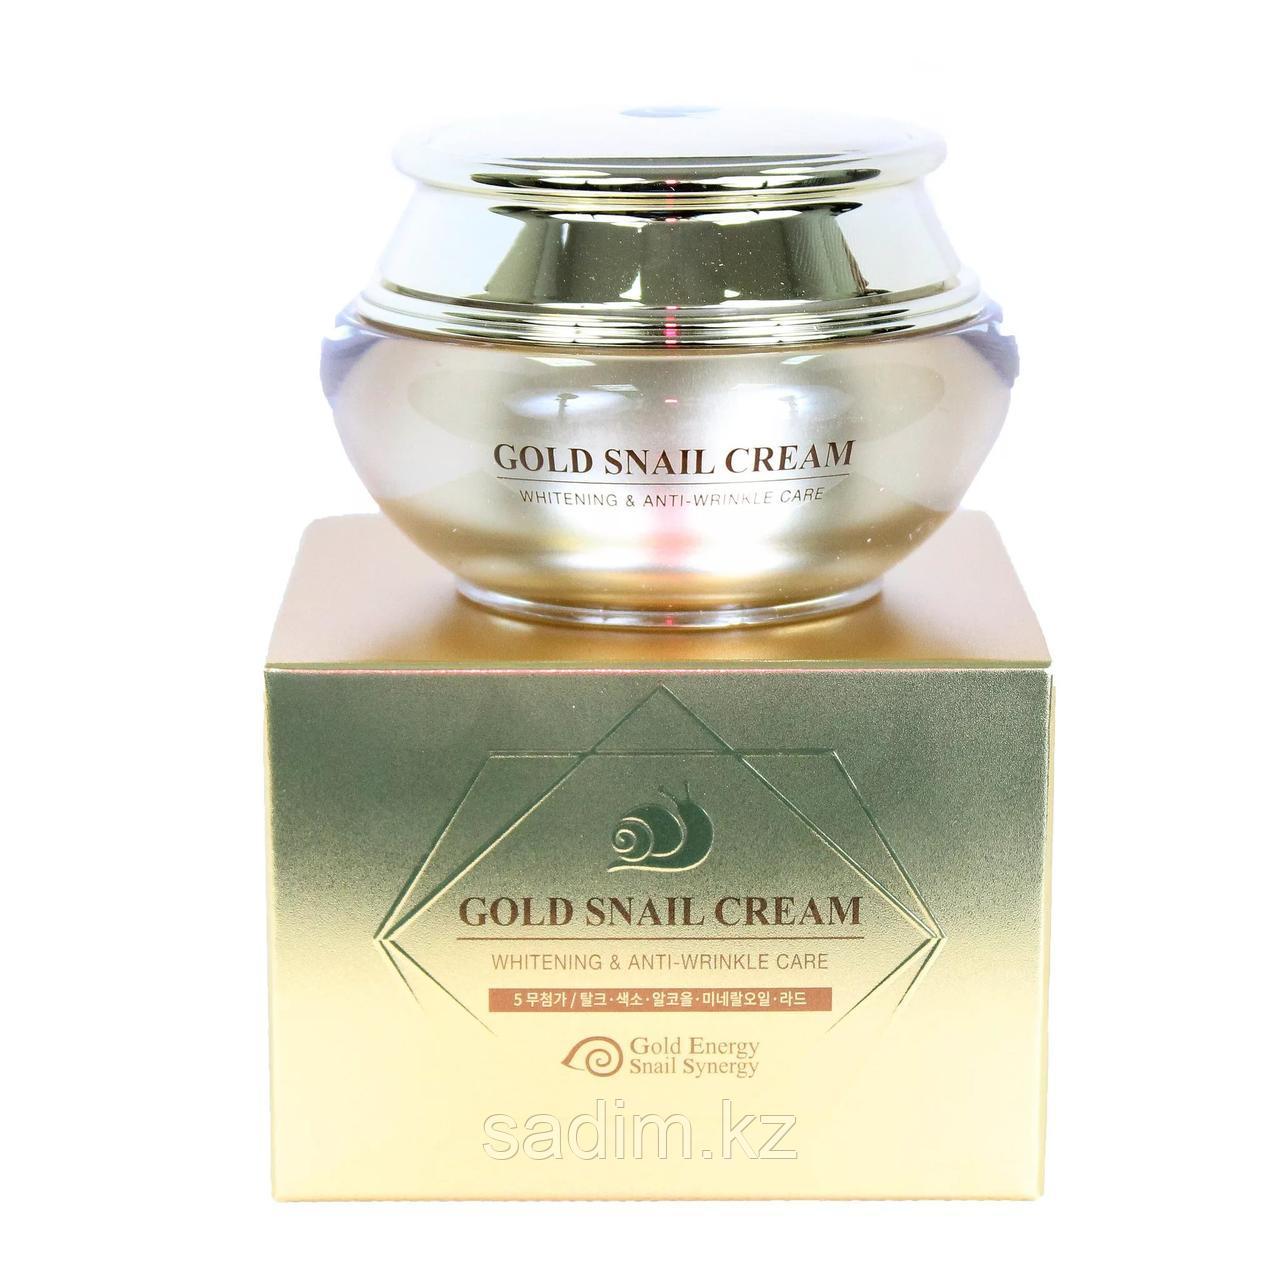 Gold Energy Snail Synergy Gold Snail Cream Whitening & Anti-Wrinkle Care - Крем для лица отбеливающий